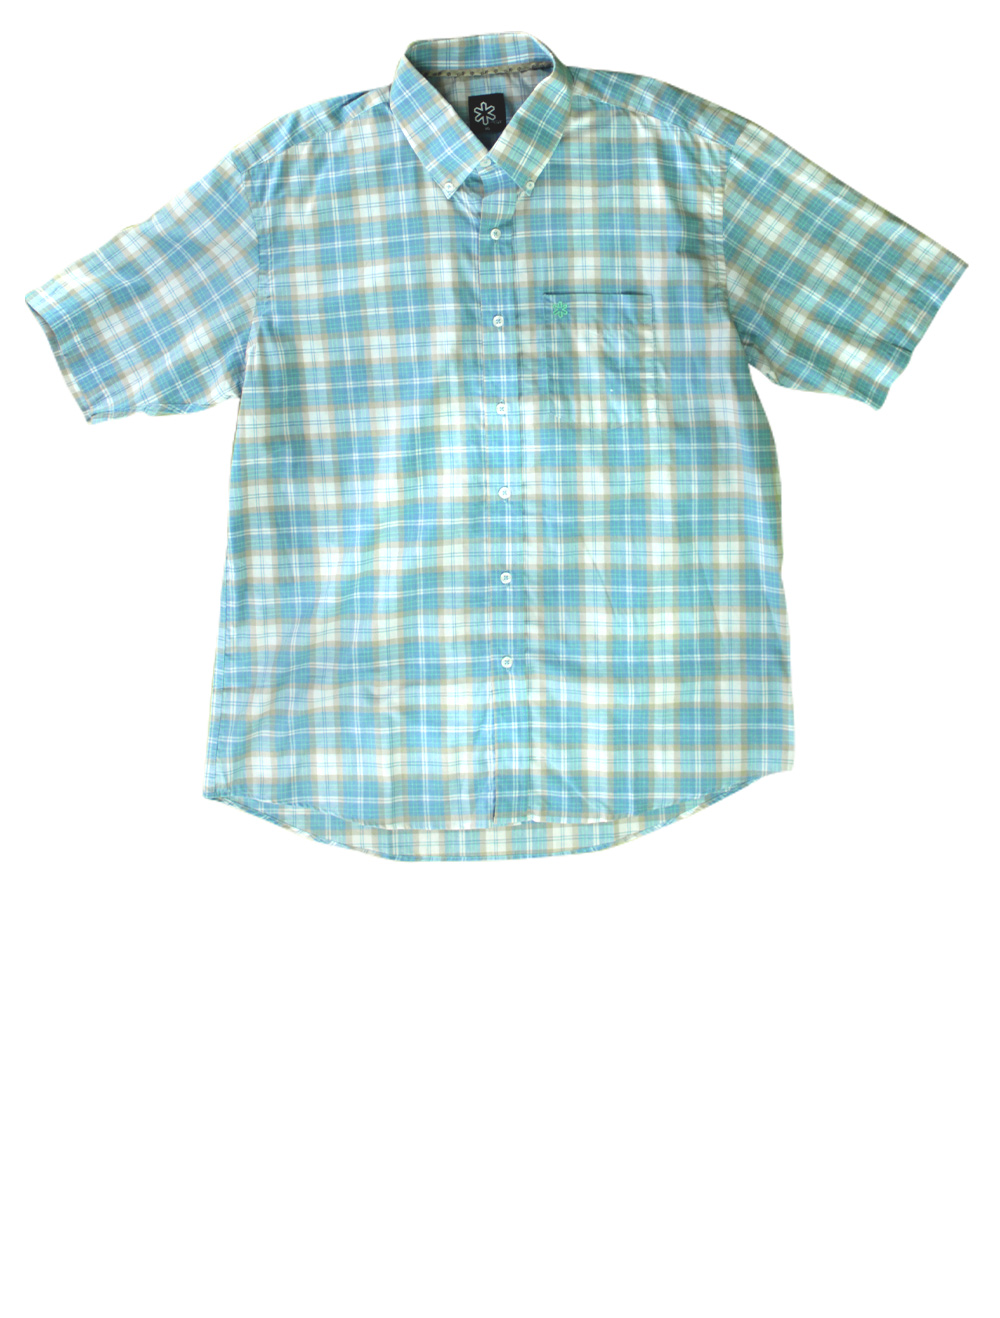 Camisa Masculina Manga Curta Xadrez Azul e Bege